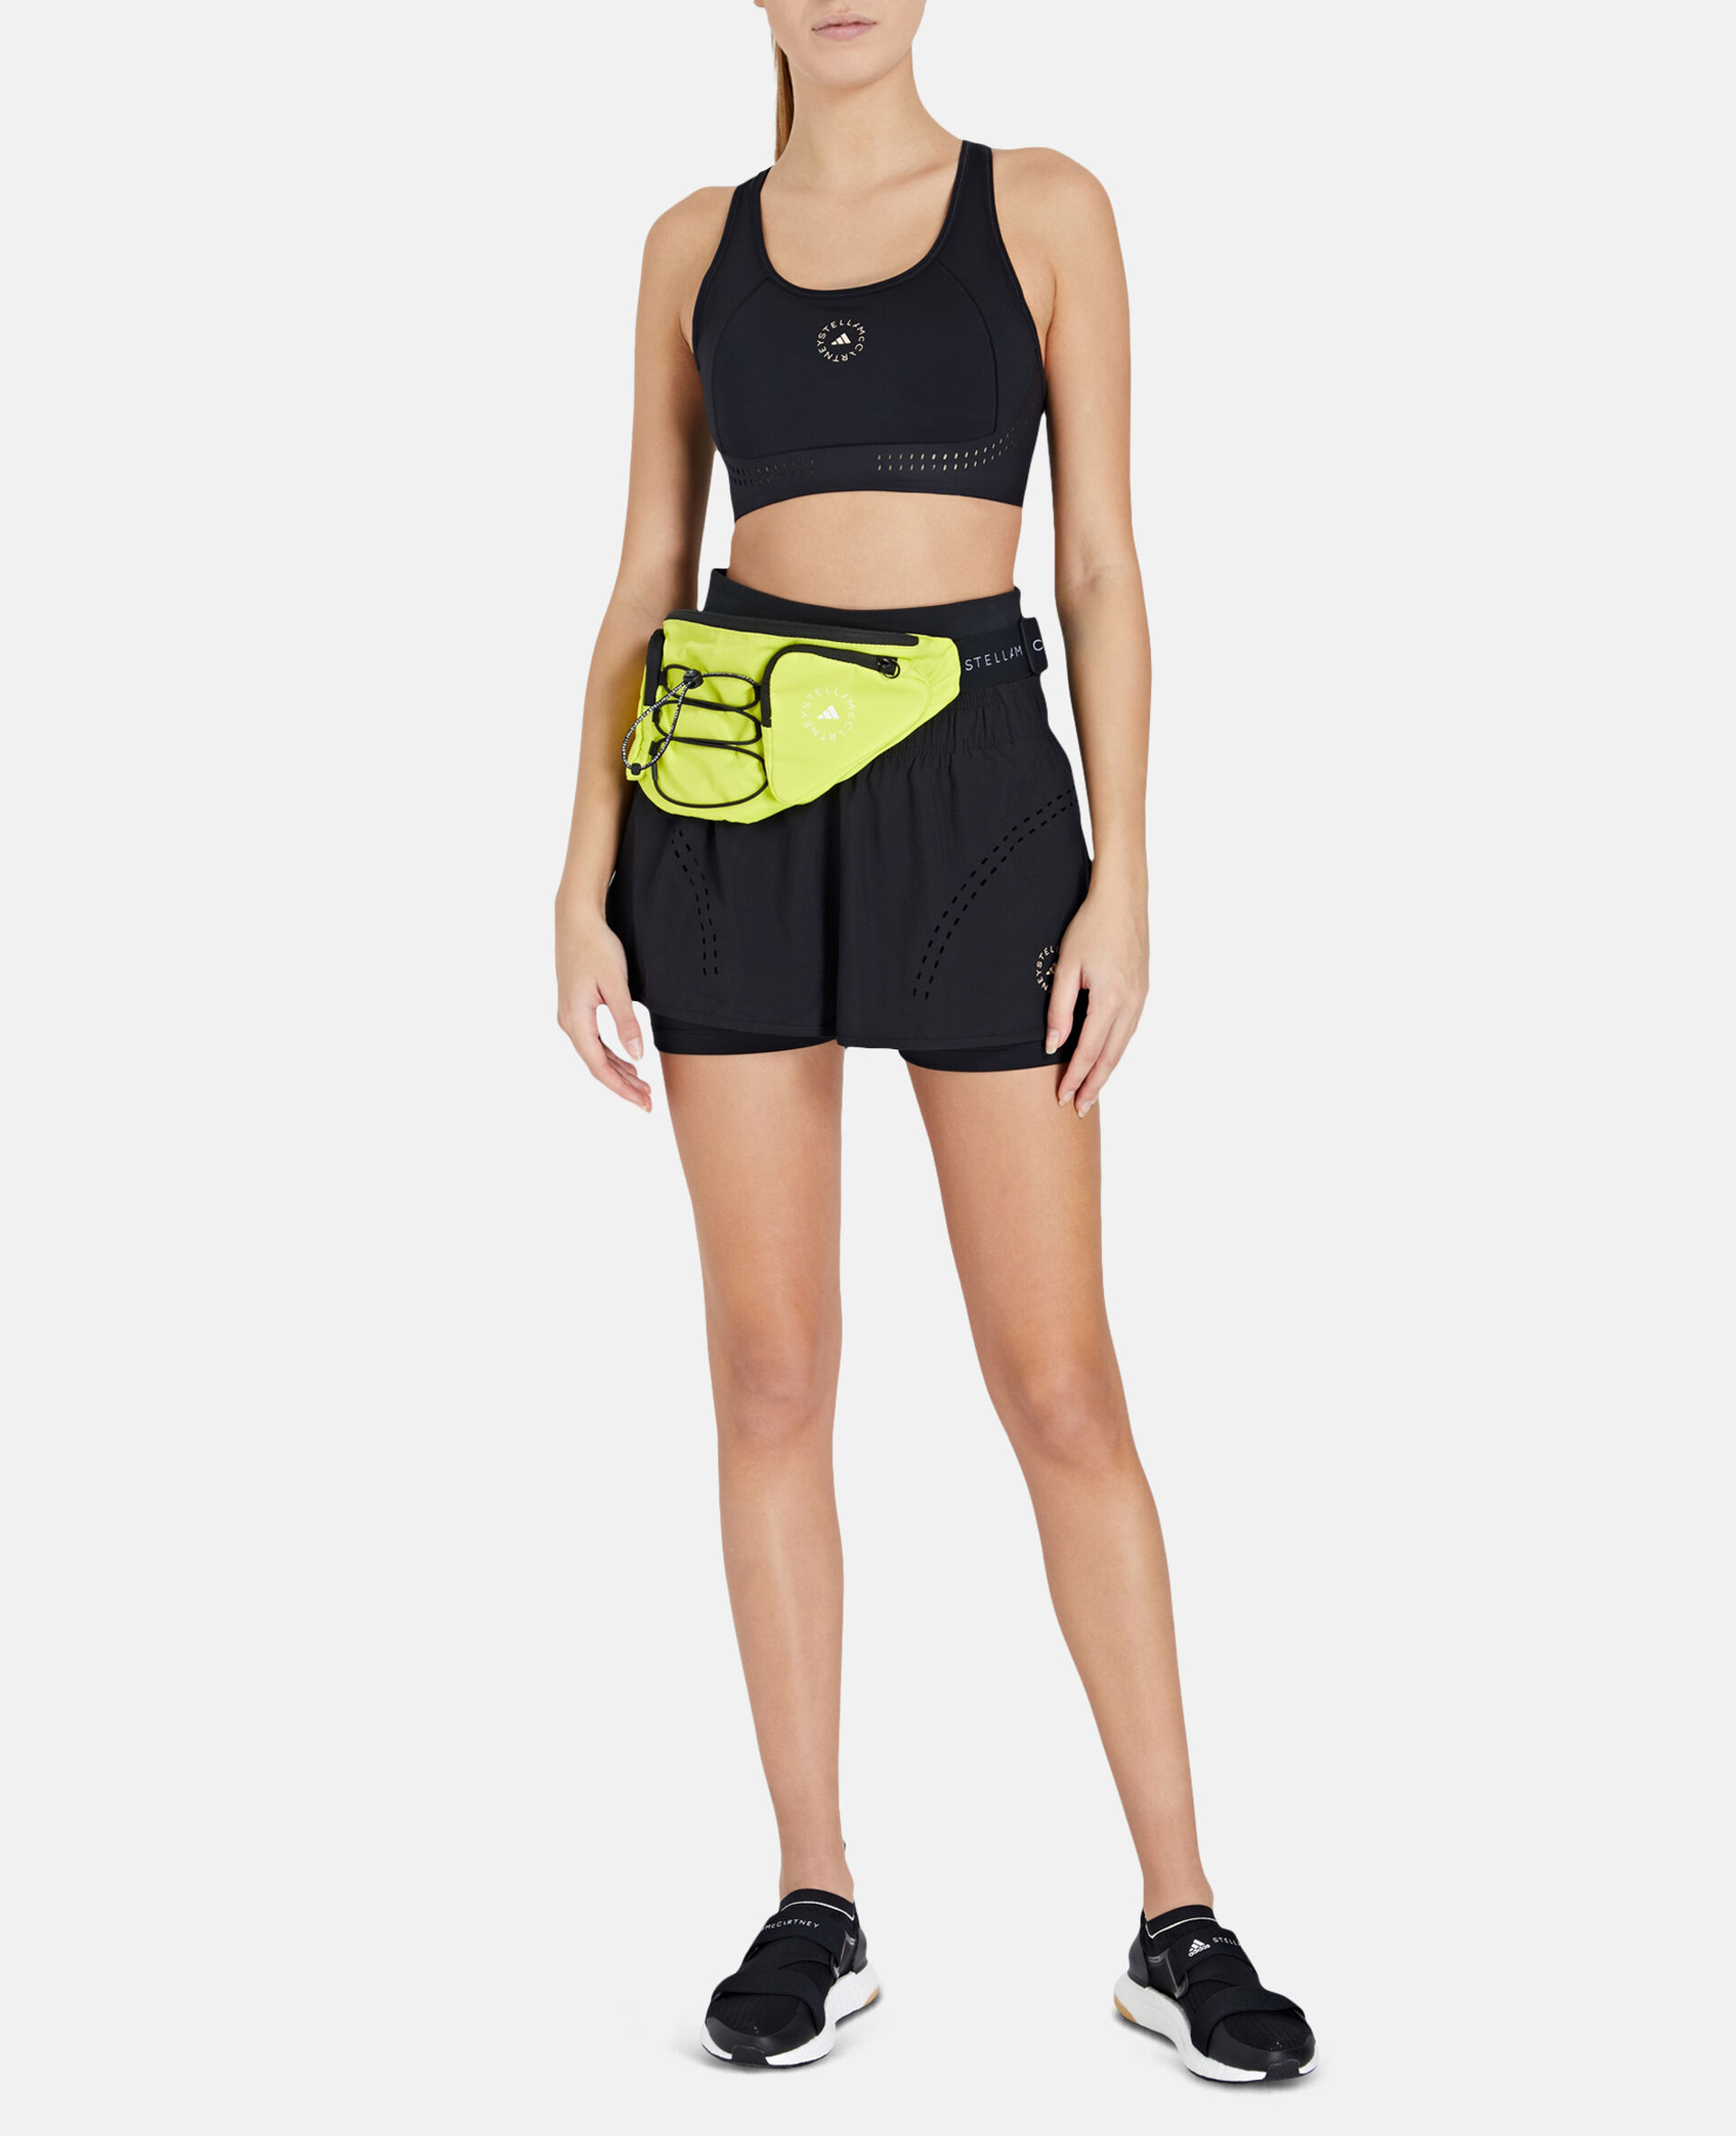 Schwarze TruePurpose Sport-Shorts-Schwarz-large image number 1